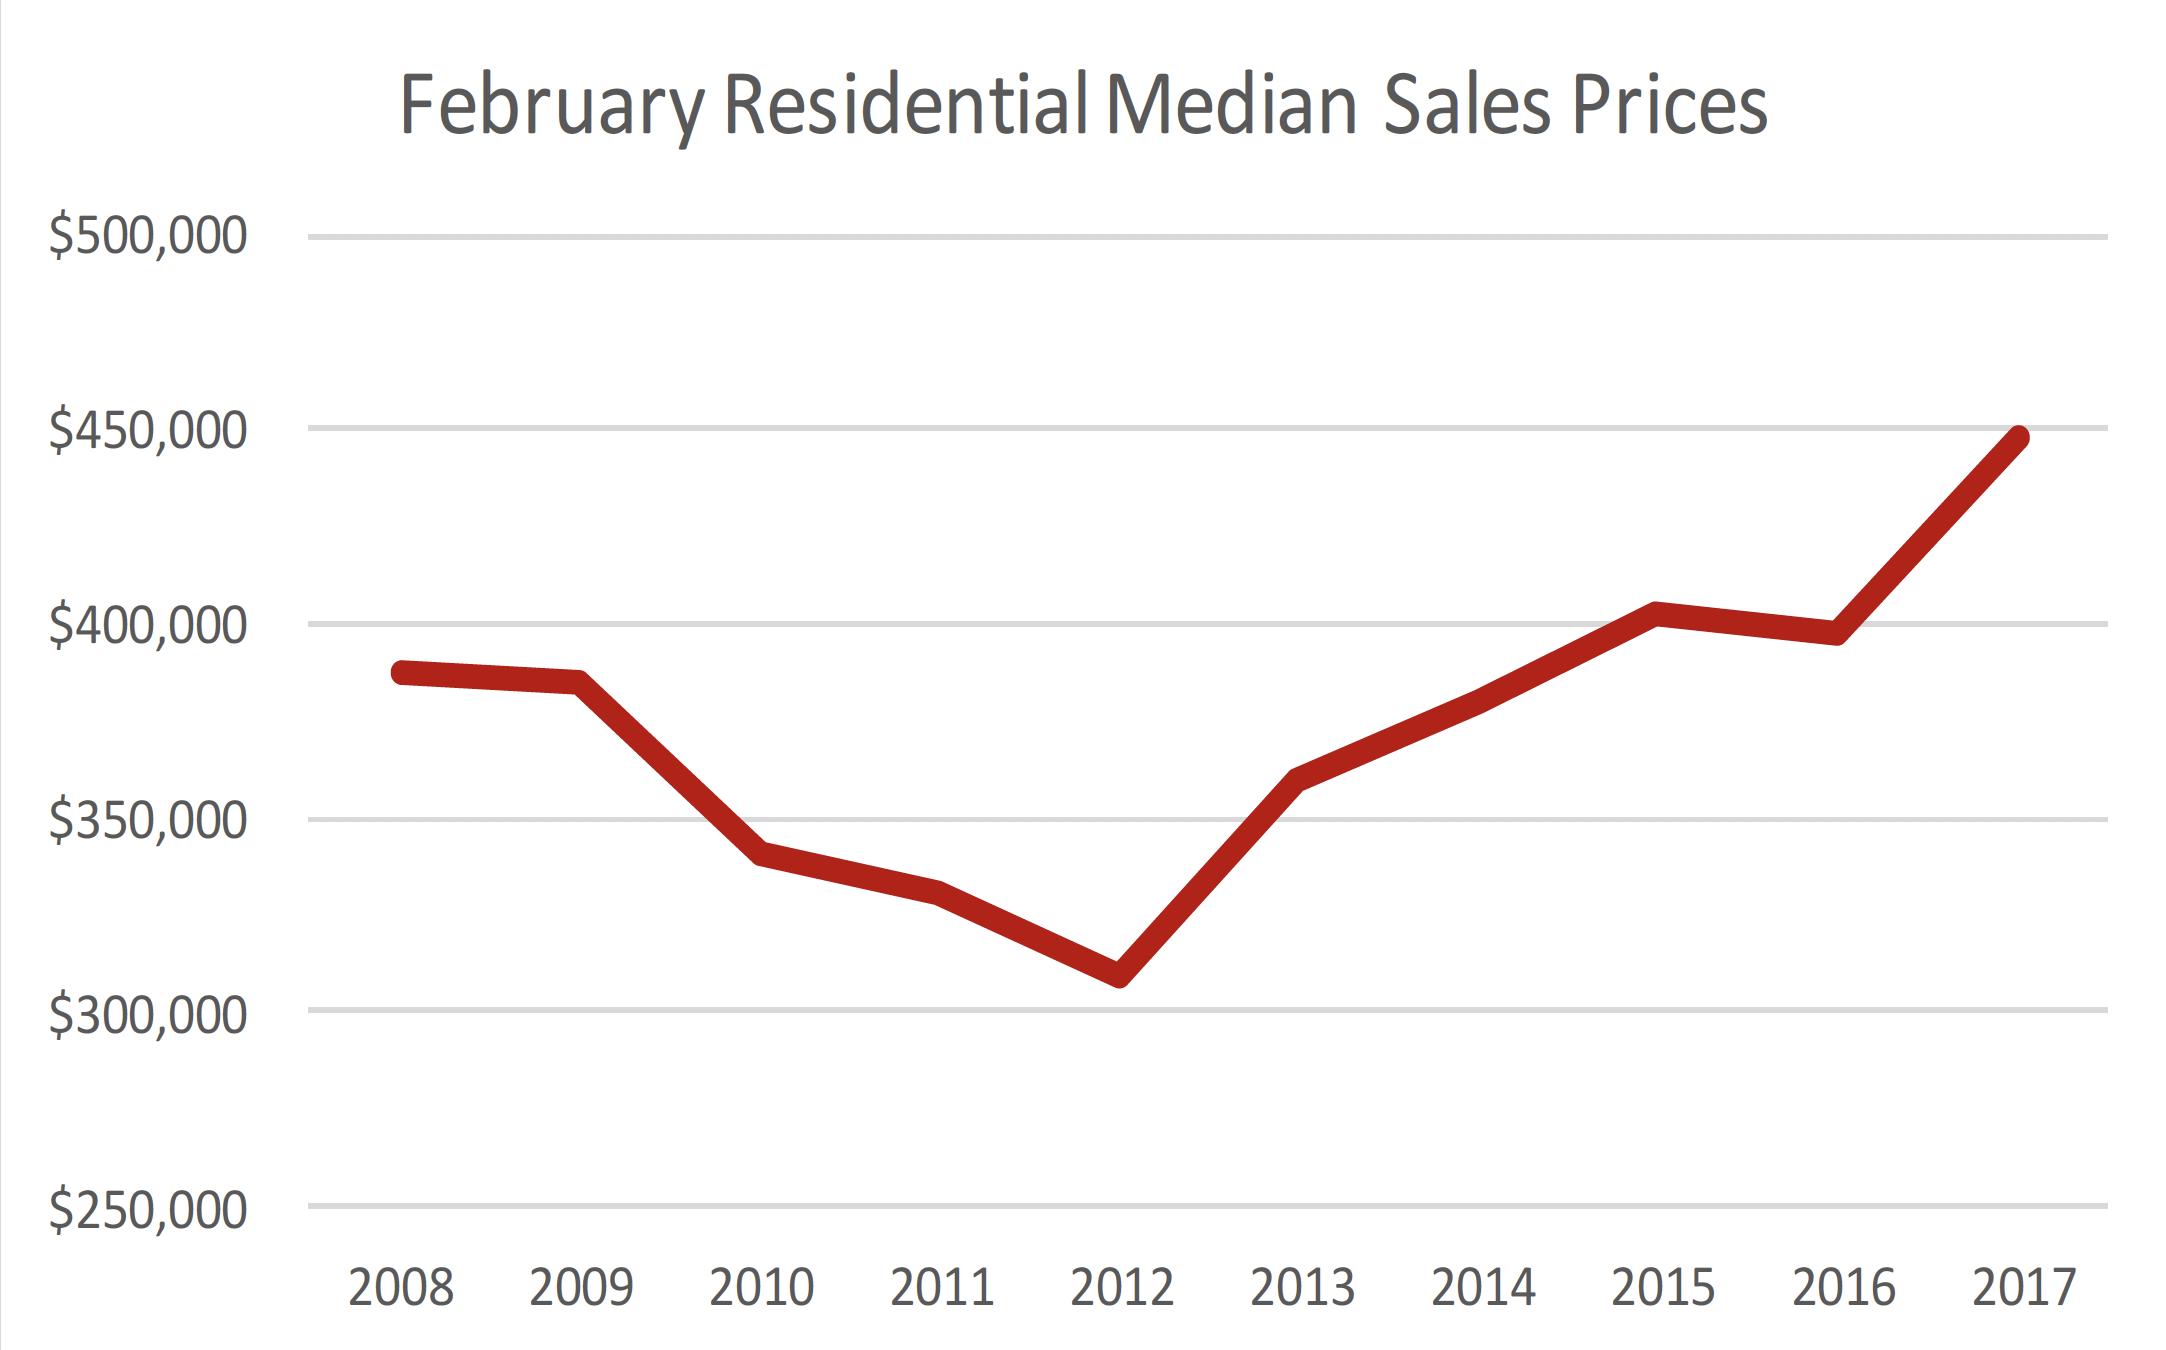 February Historic Residential Median Price